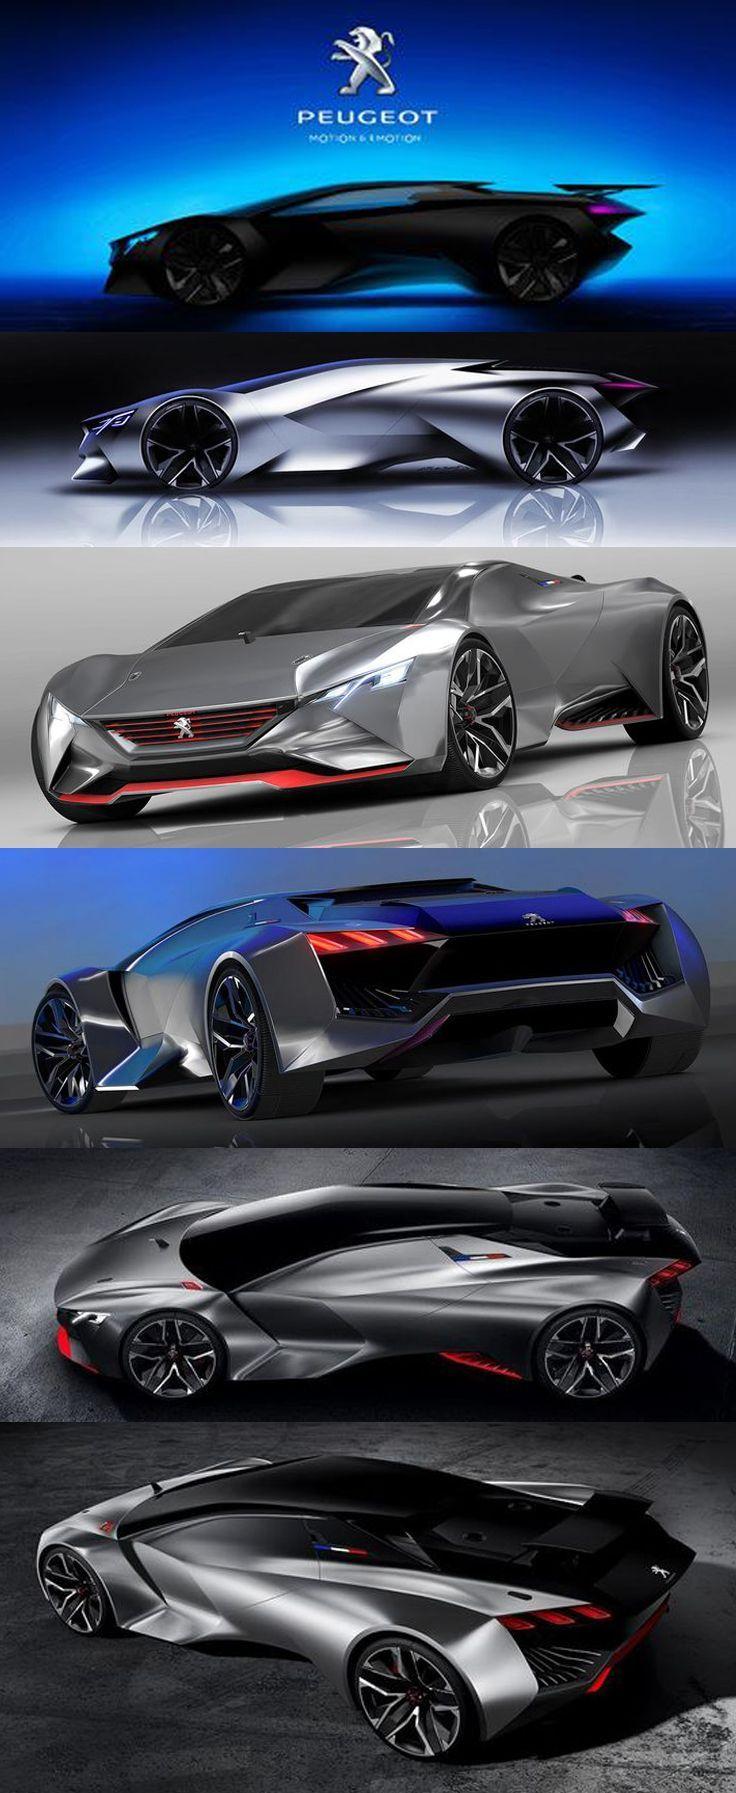 2017 peugeot vision gran turismo concept new car spy shots 2017 concept cars pics and new 2017 car photos new car spy shots 2017 concept cars pics